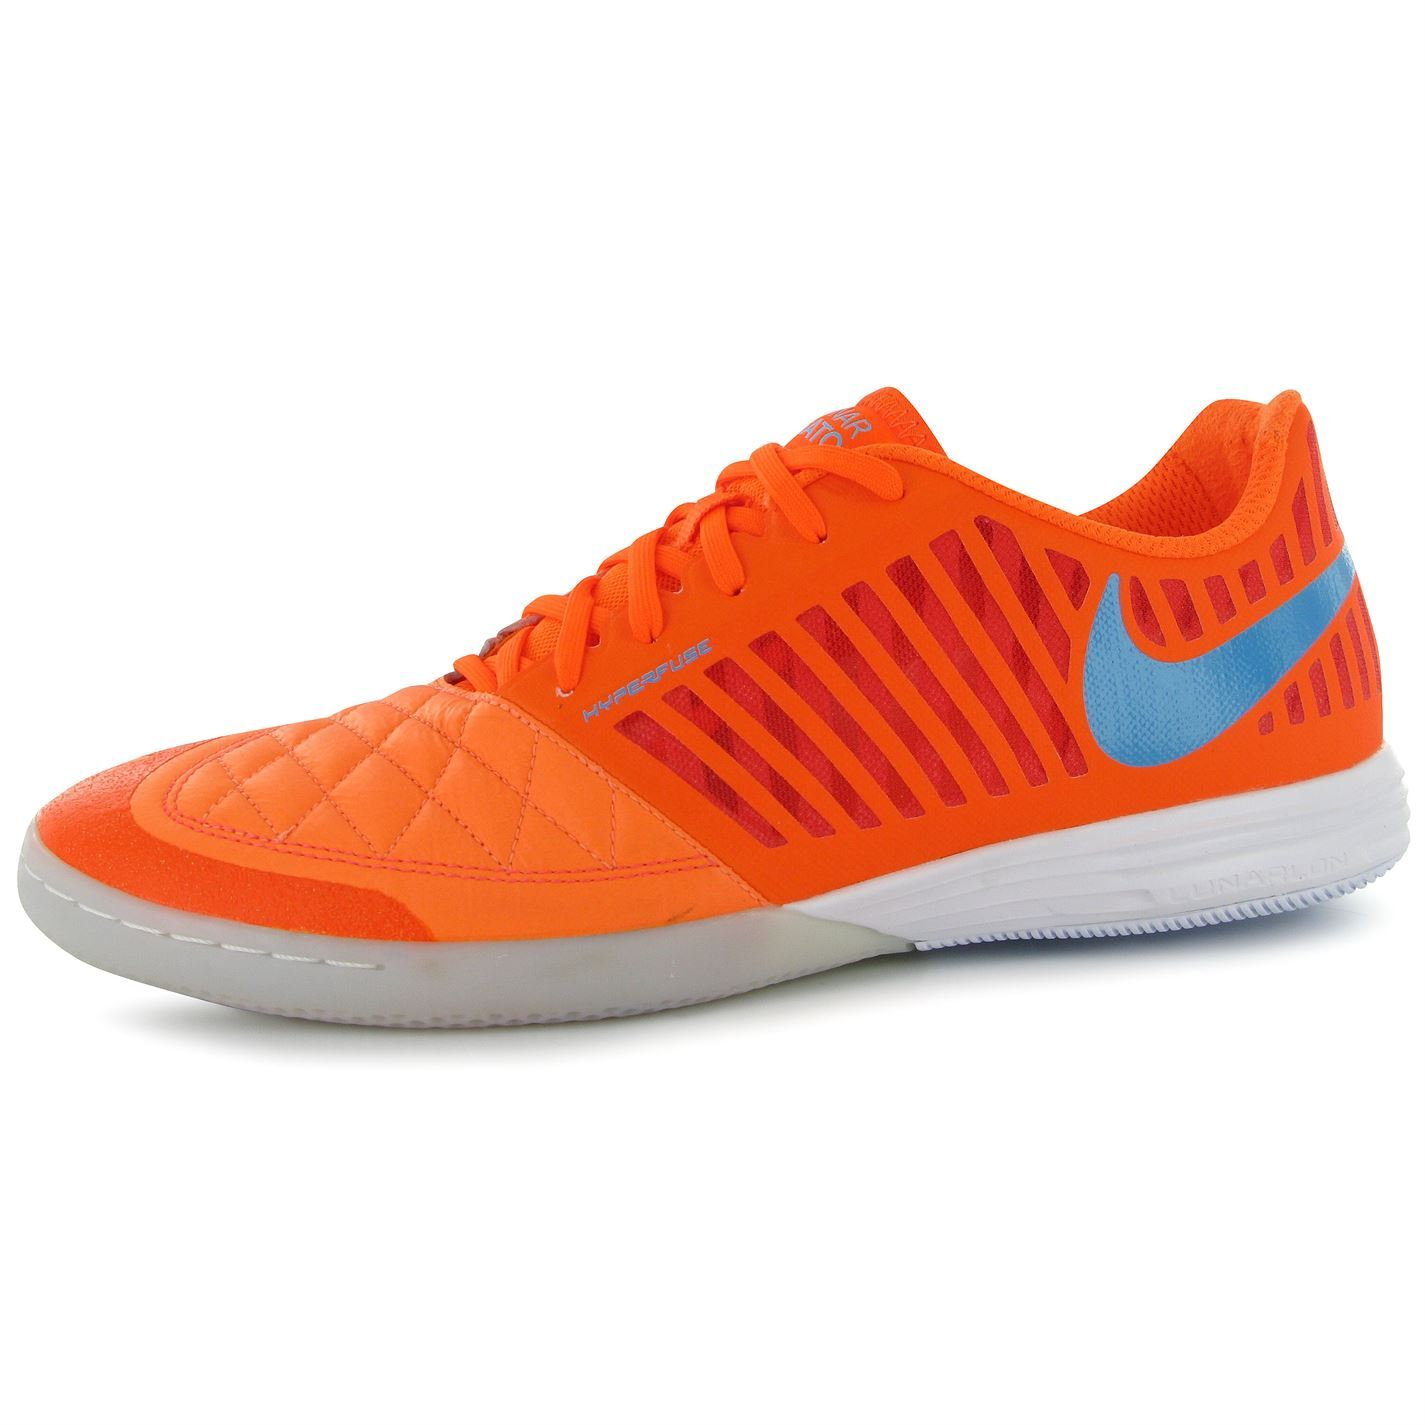 Nike 5 Lunar Gato II Mens Indoor Futsal Football Trainers Orng/Blu Soccer  Boots